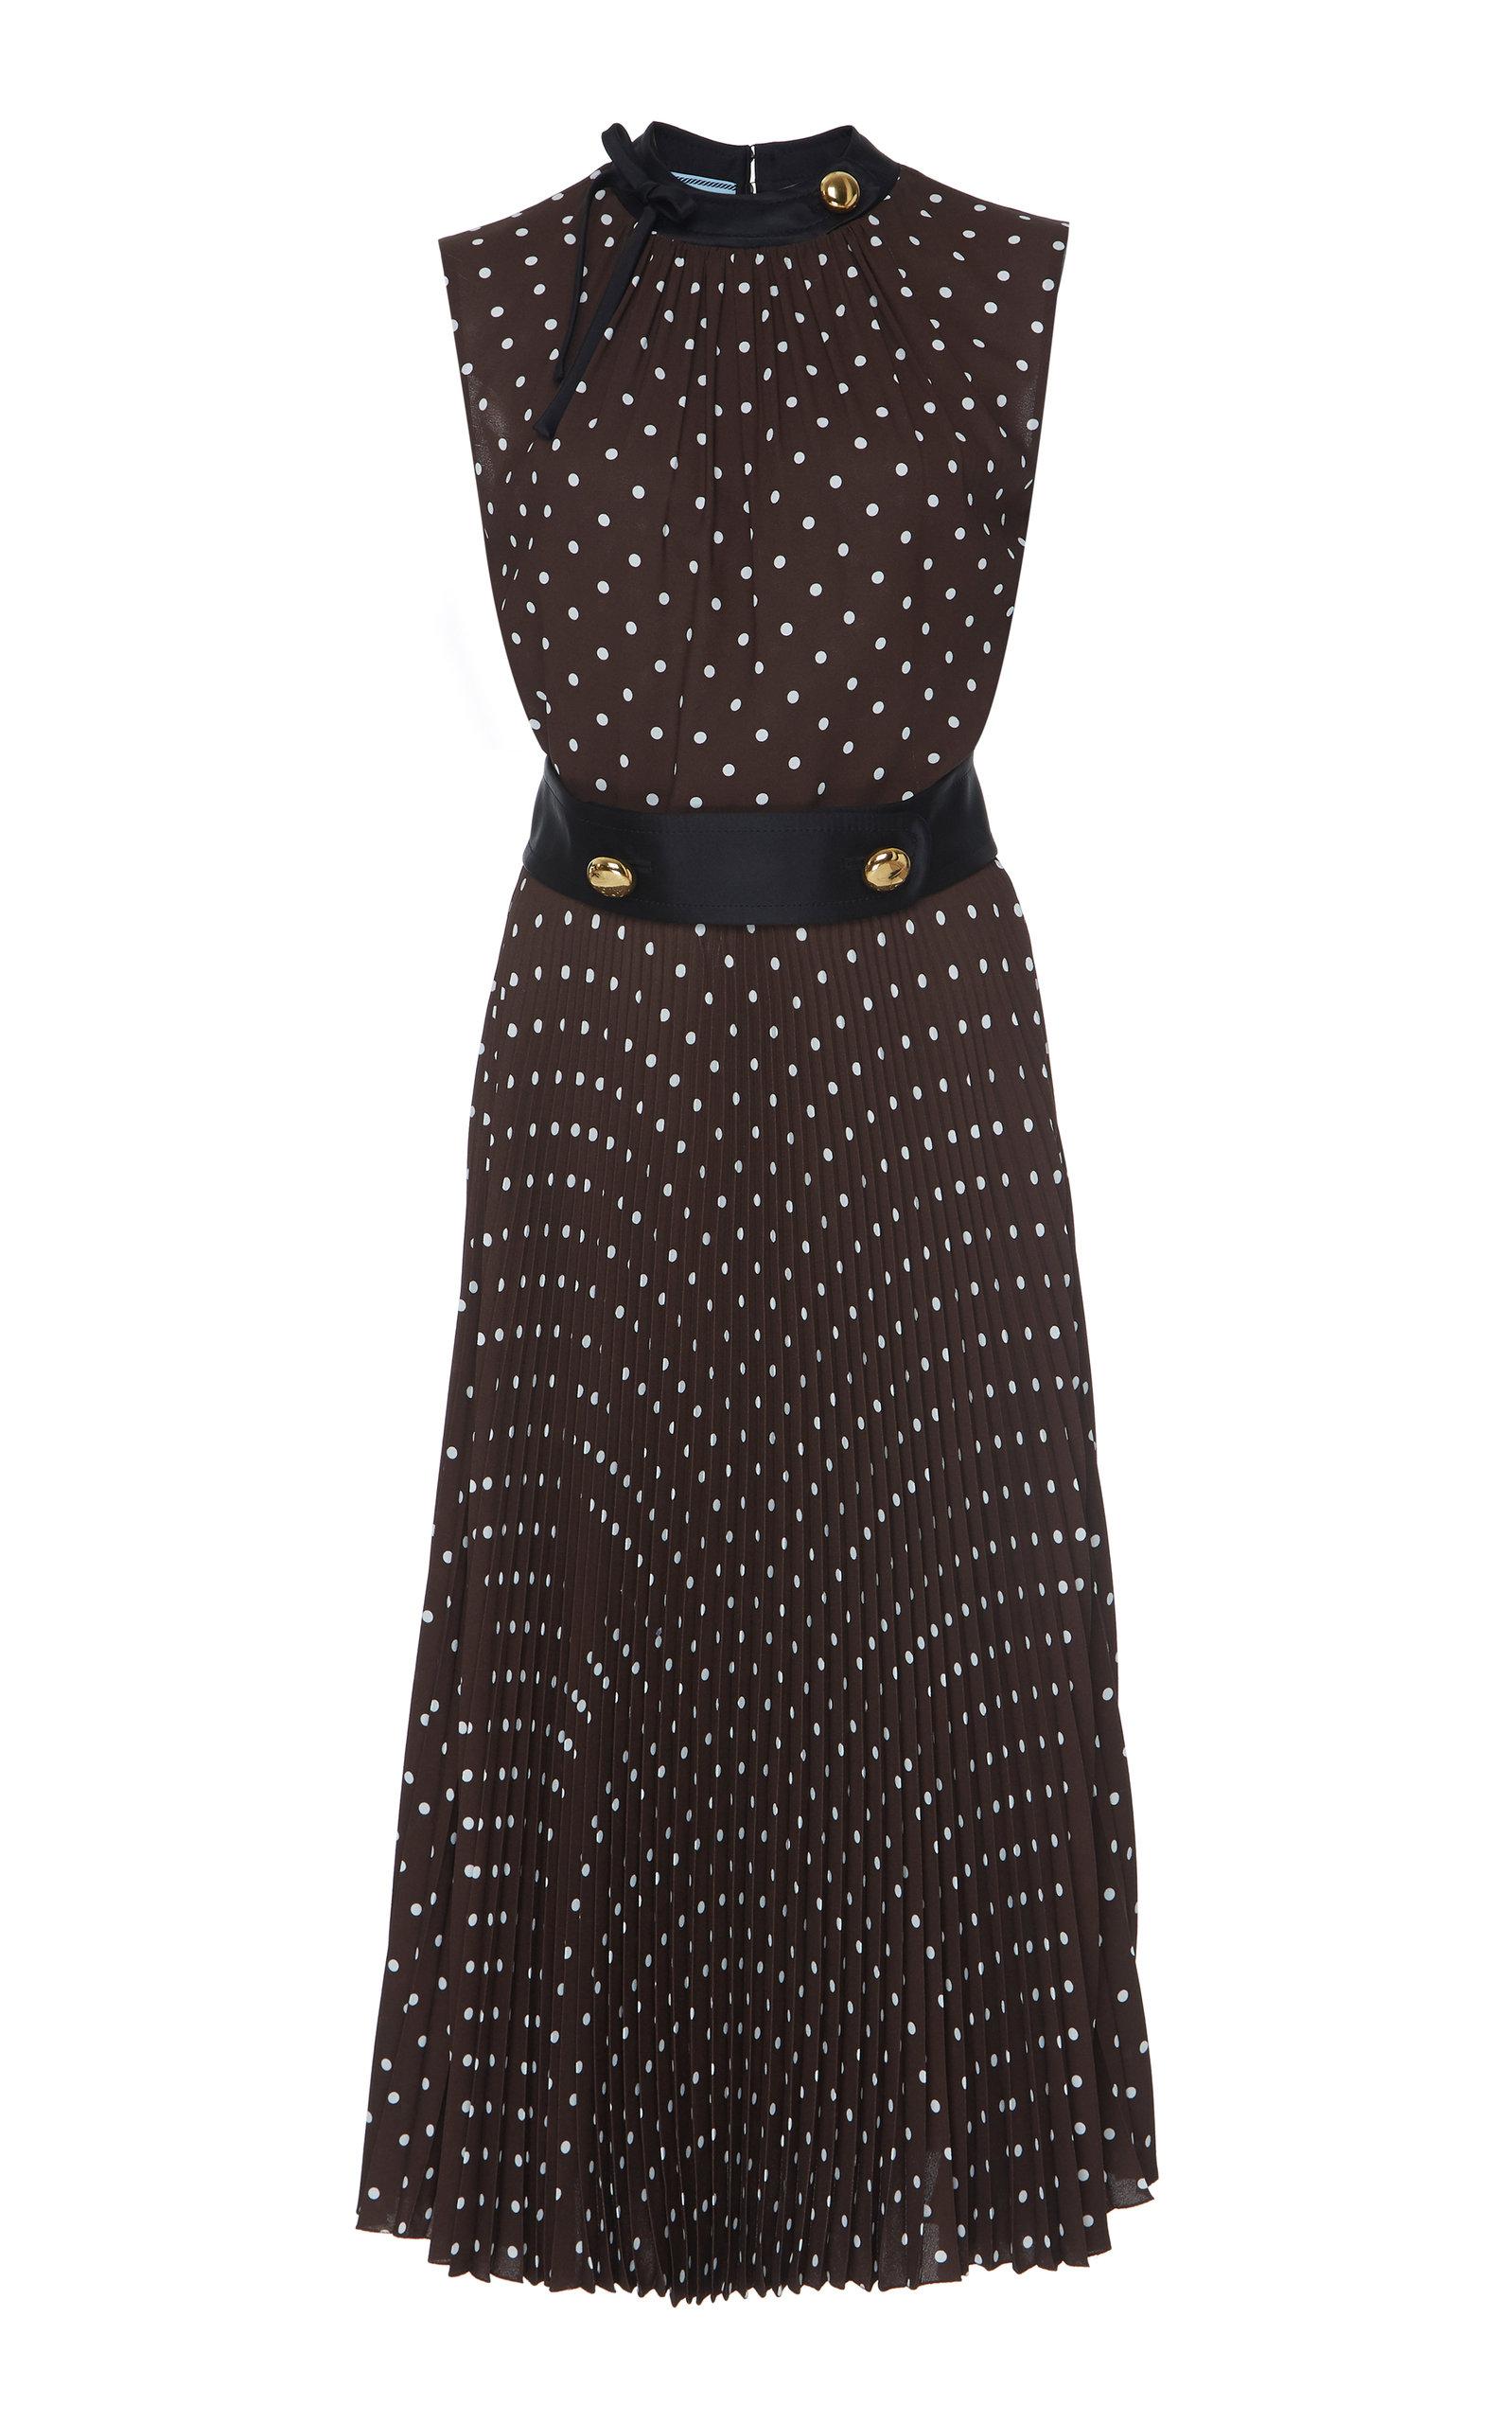 Buy Prada Button-Detailed Polka-Dot Crepe De Chine Midi Dress online, shop Prada at the best price